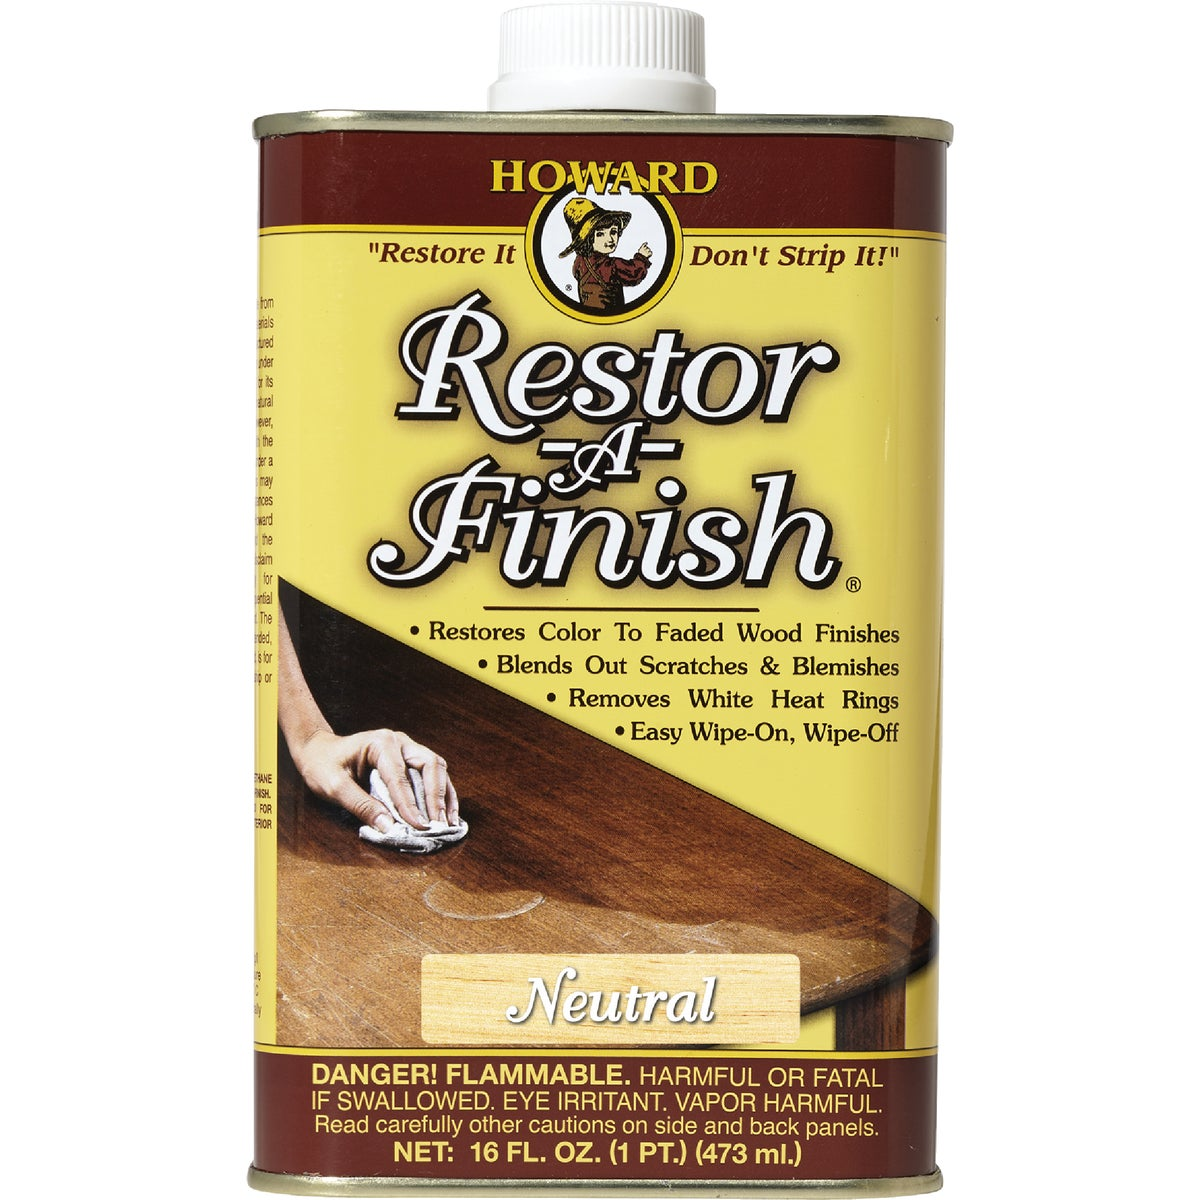 NEUTRAL RESTOR-A-FINISH